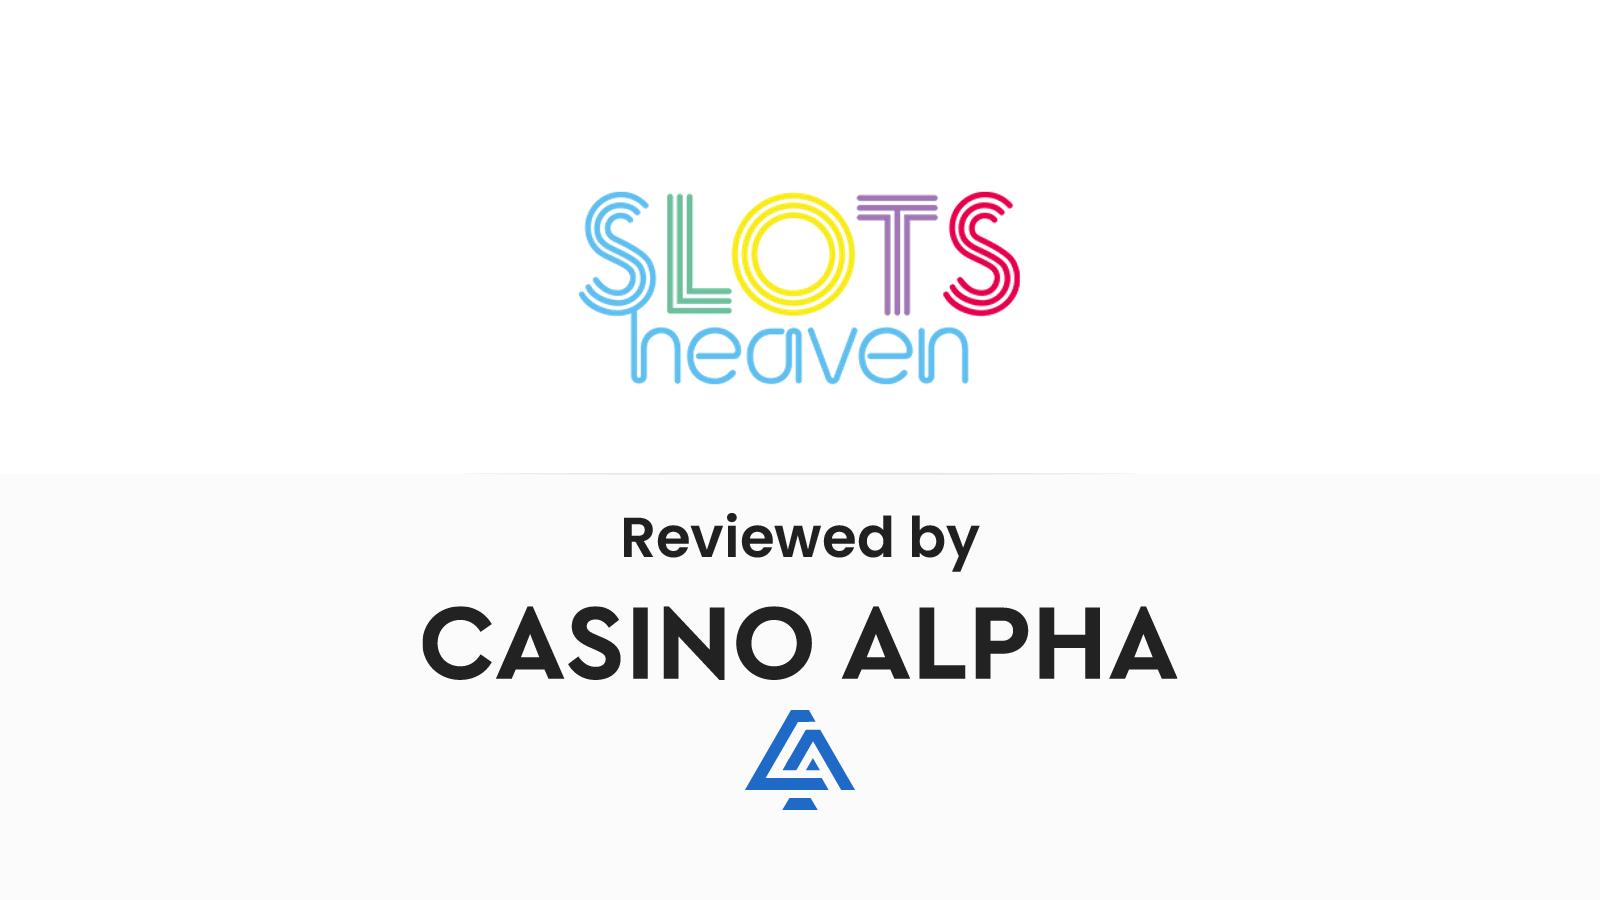 Slots Heaven Review & Bonus codes